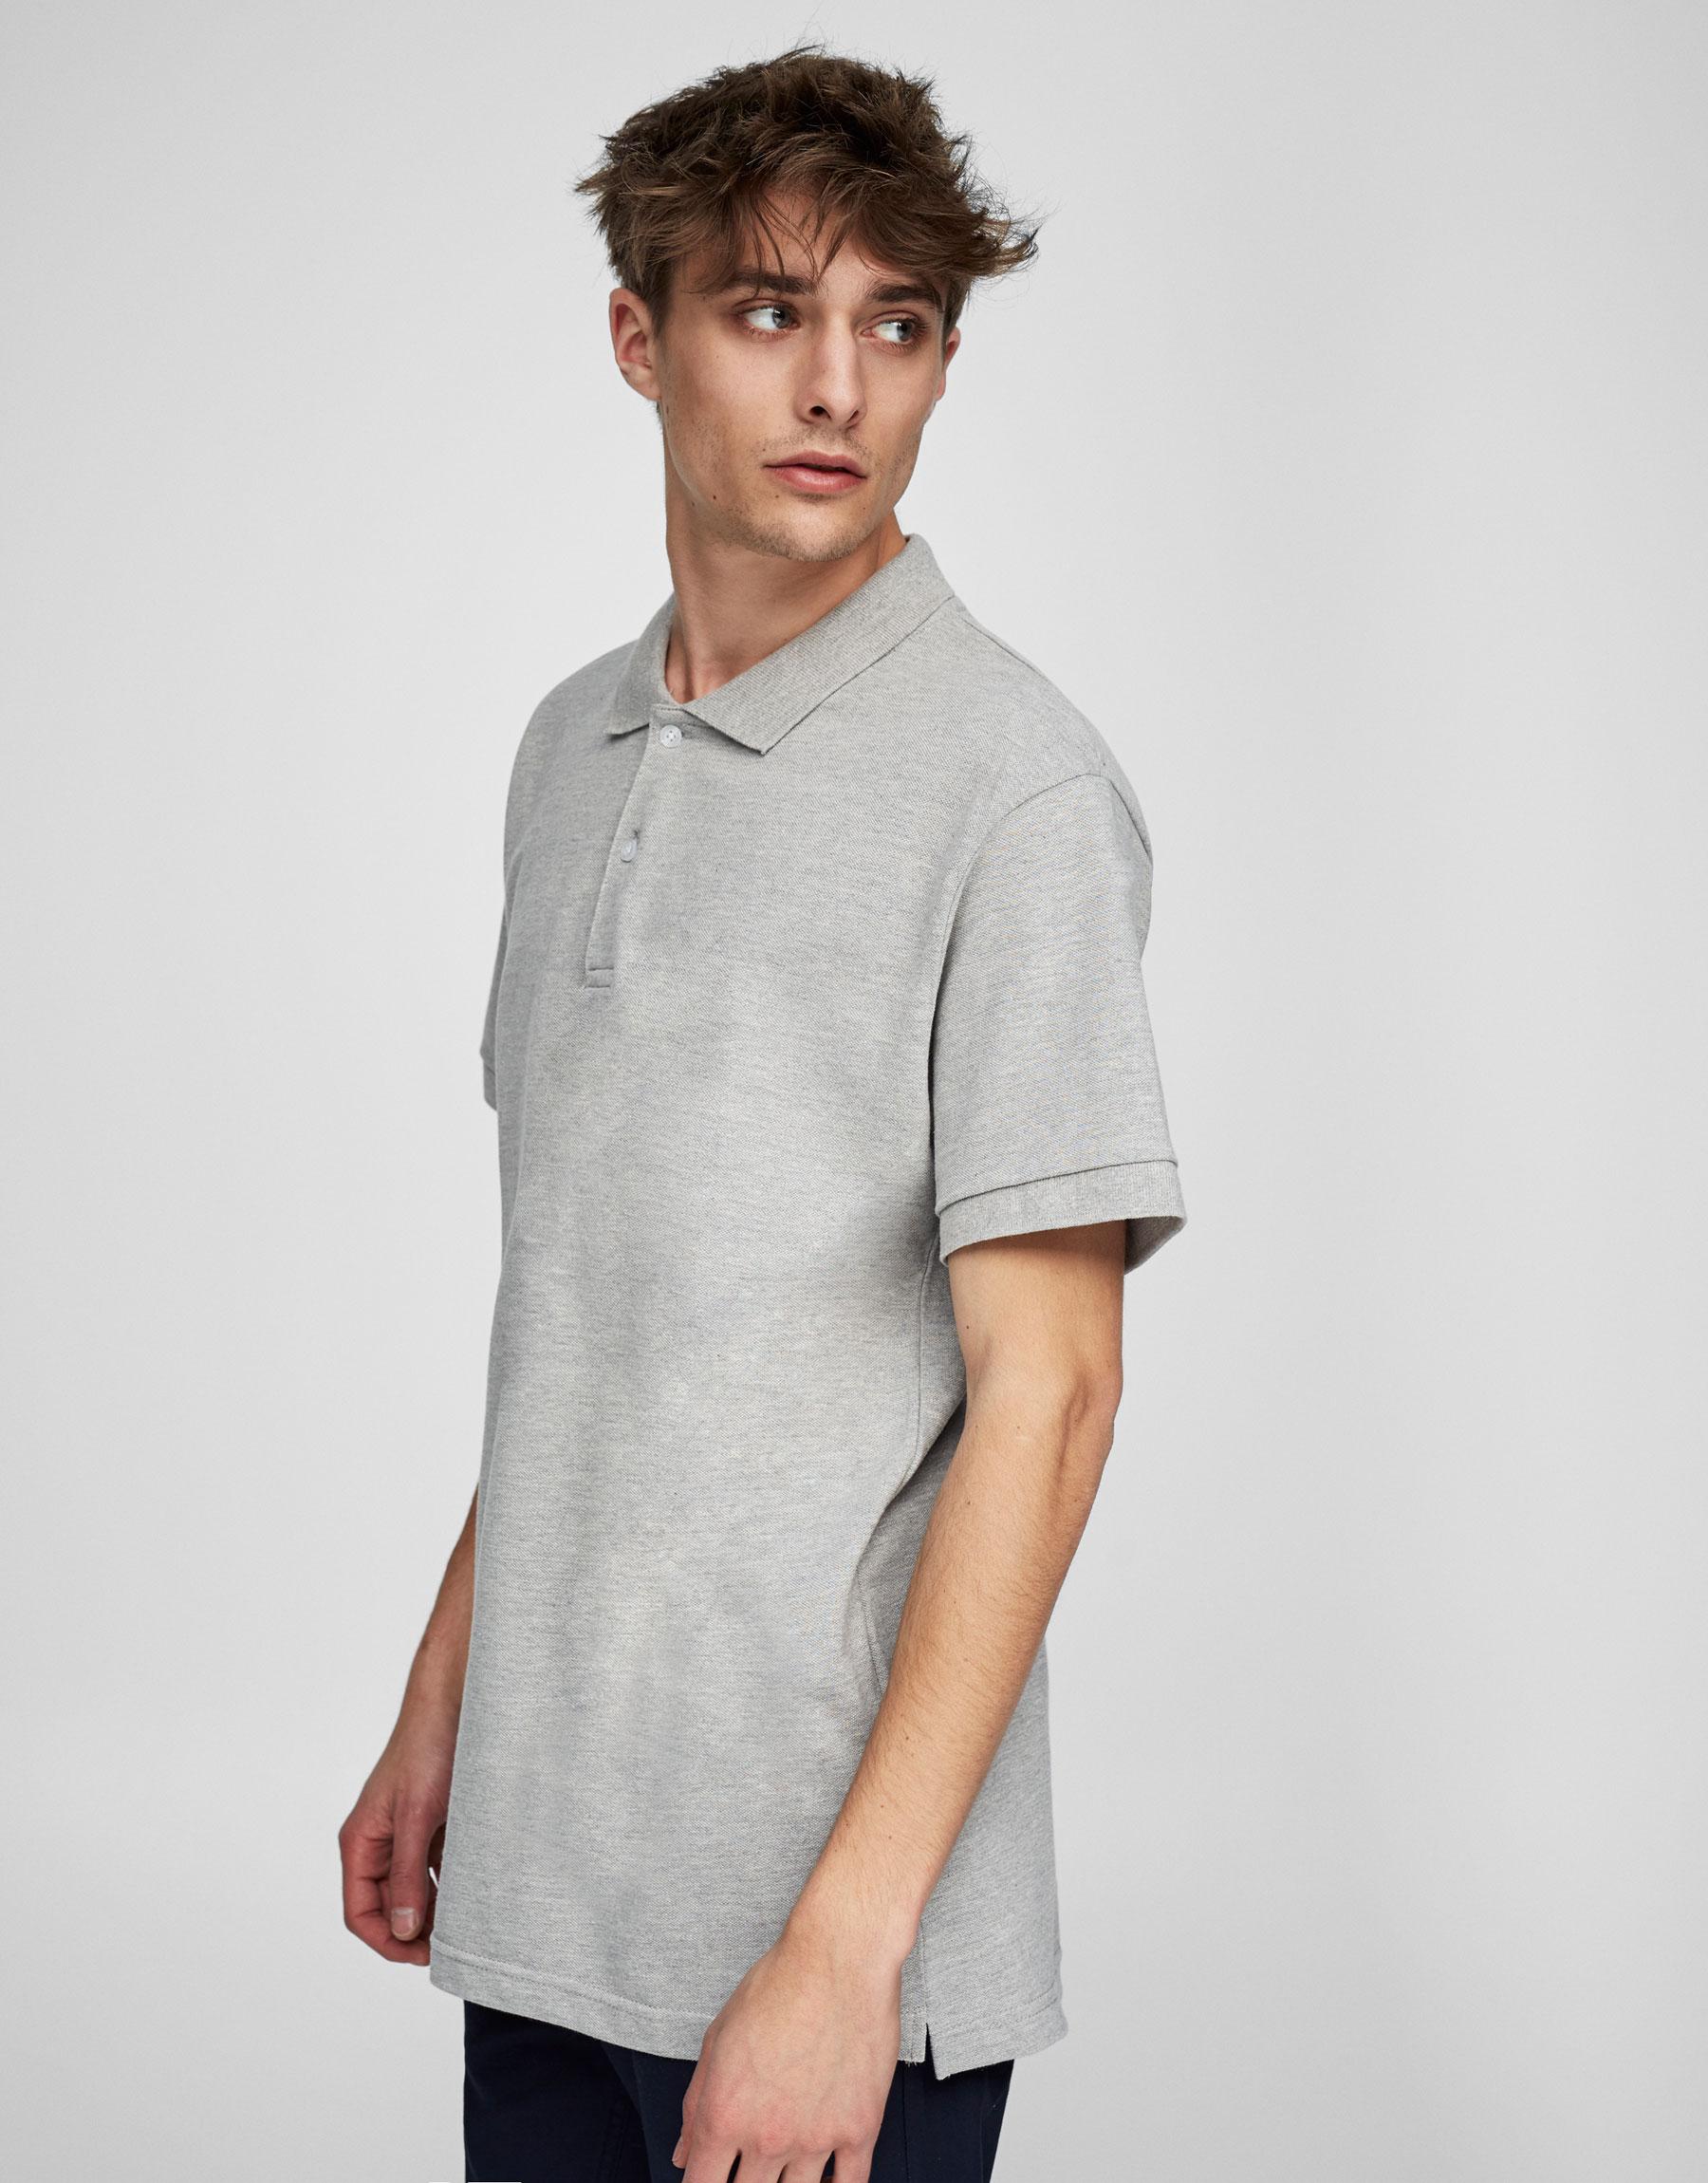 Basic colourful polo shirt